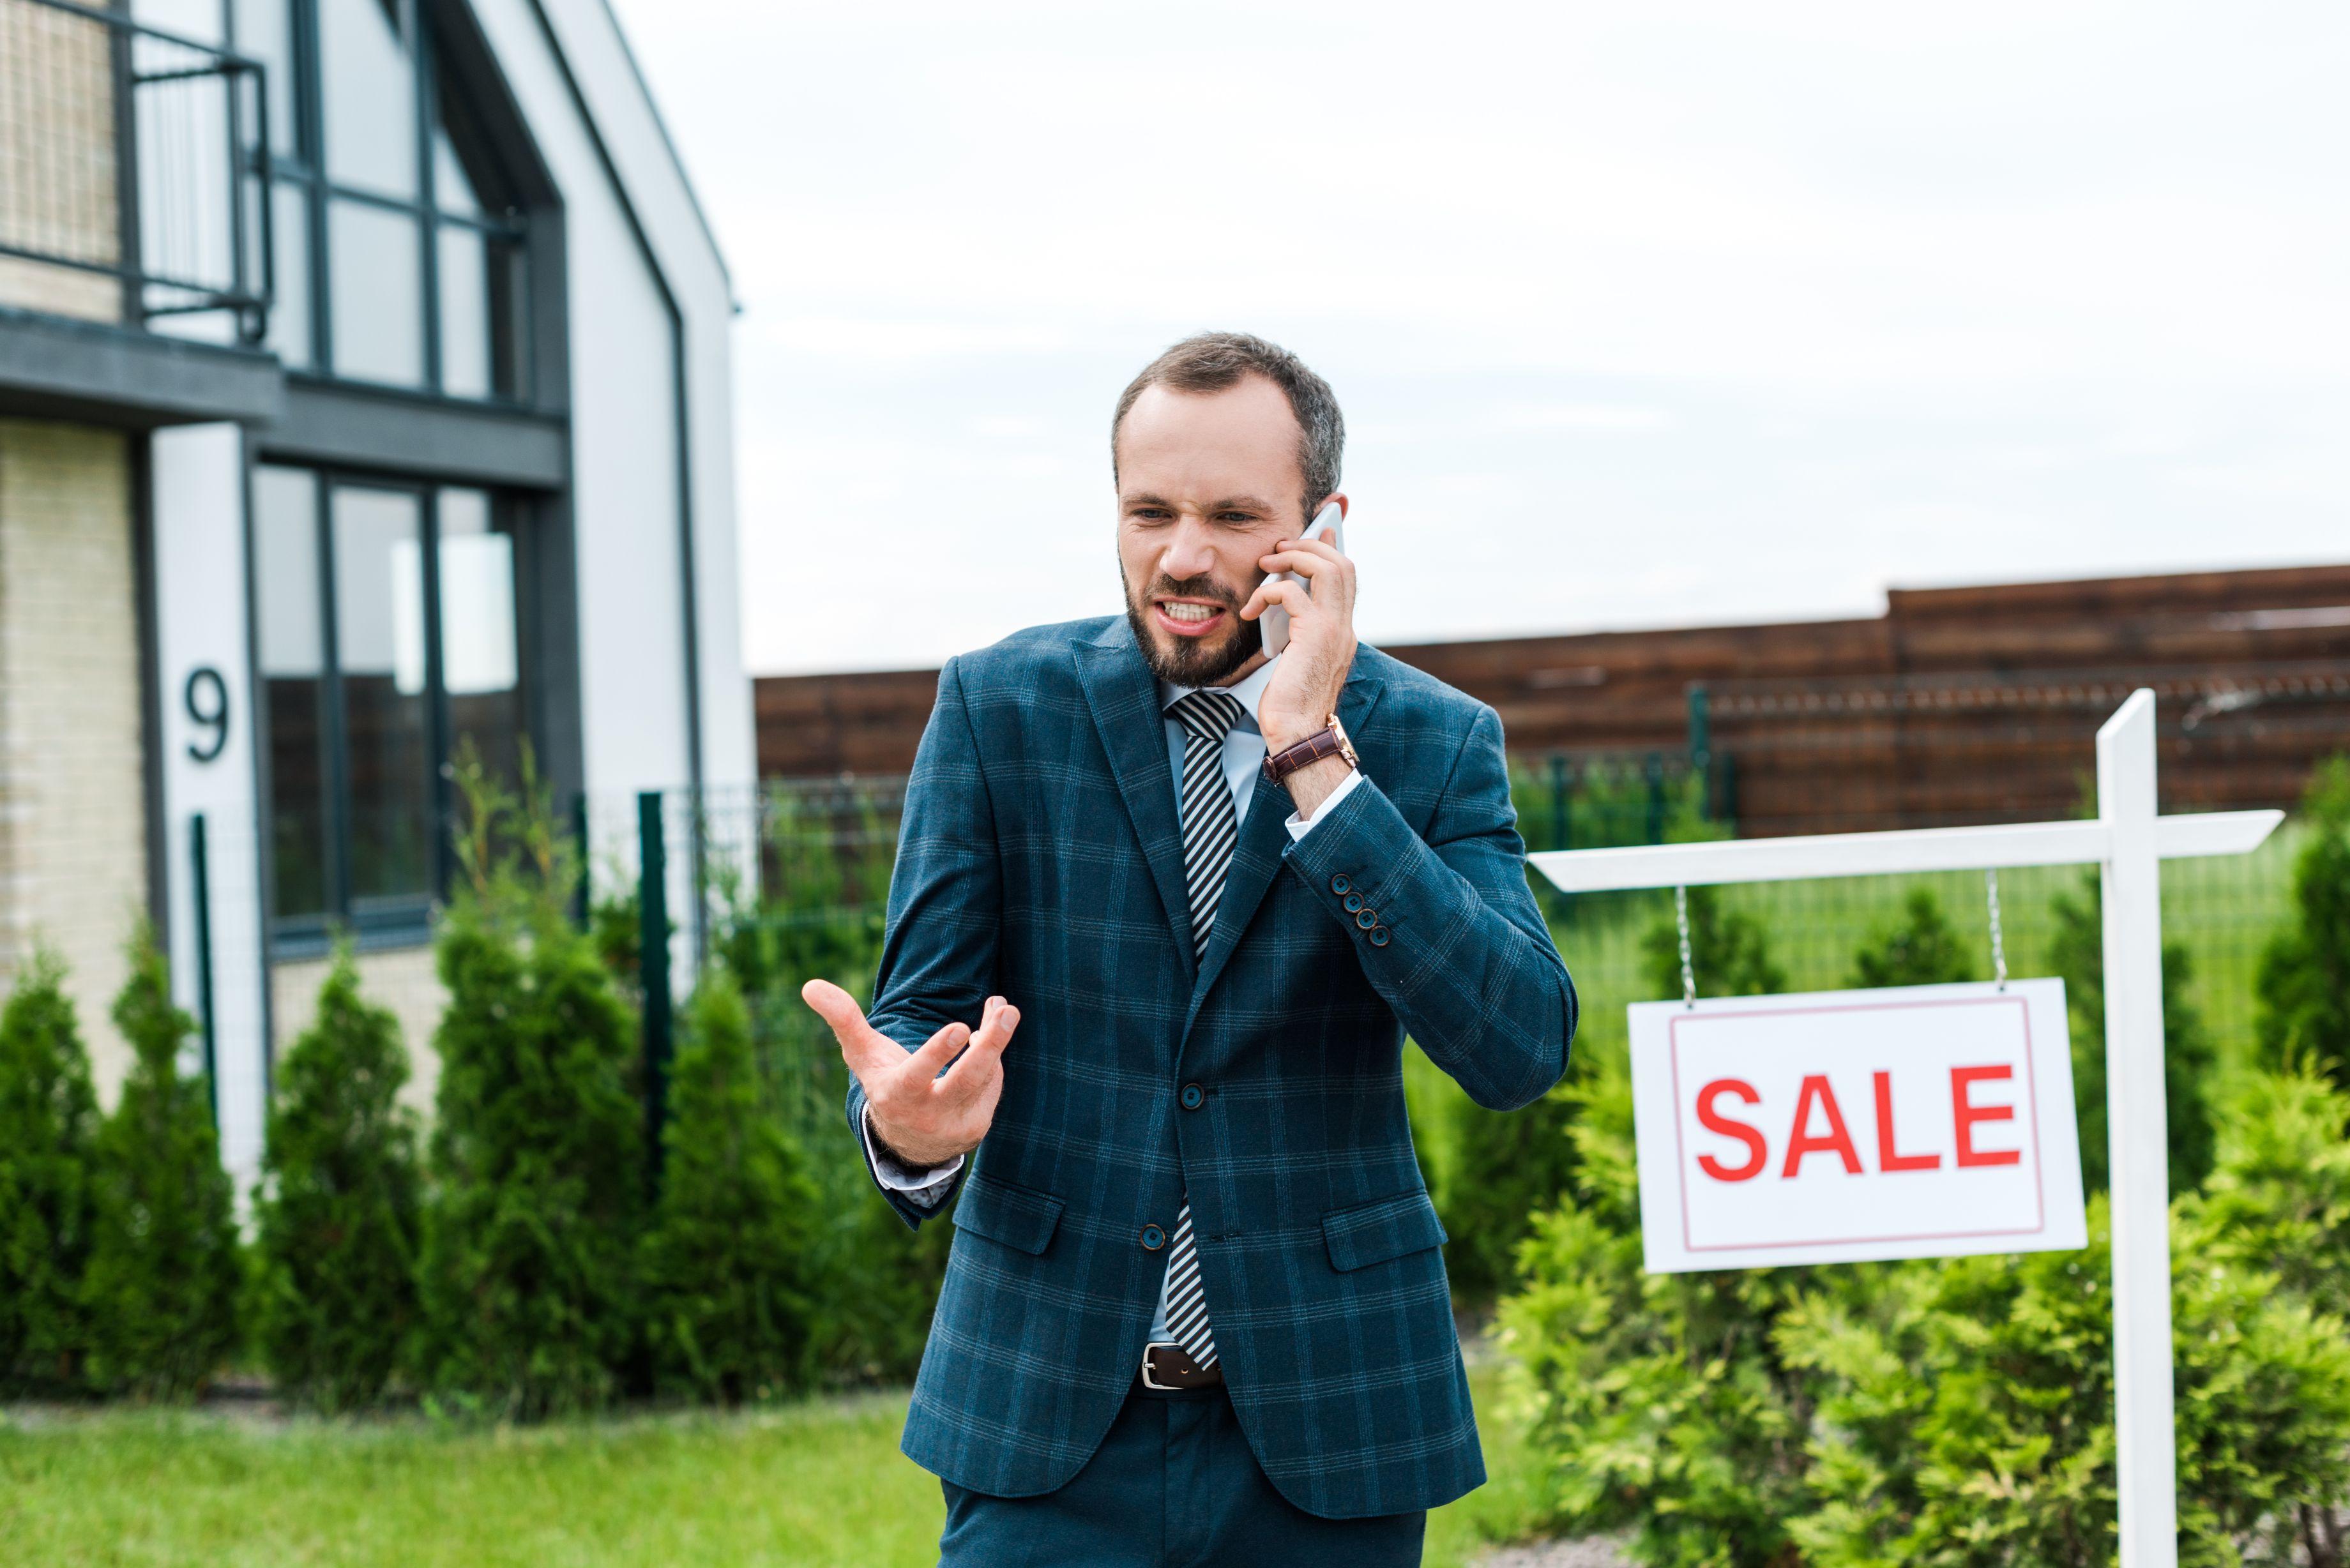 maison a vendre saguenay strategie